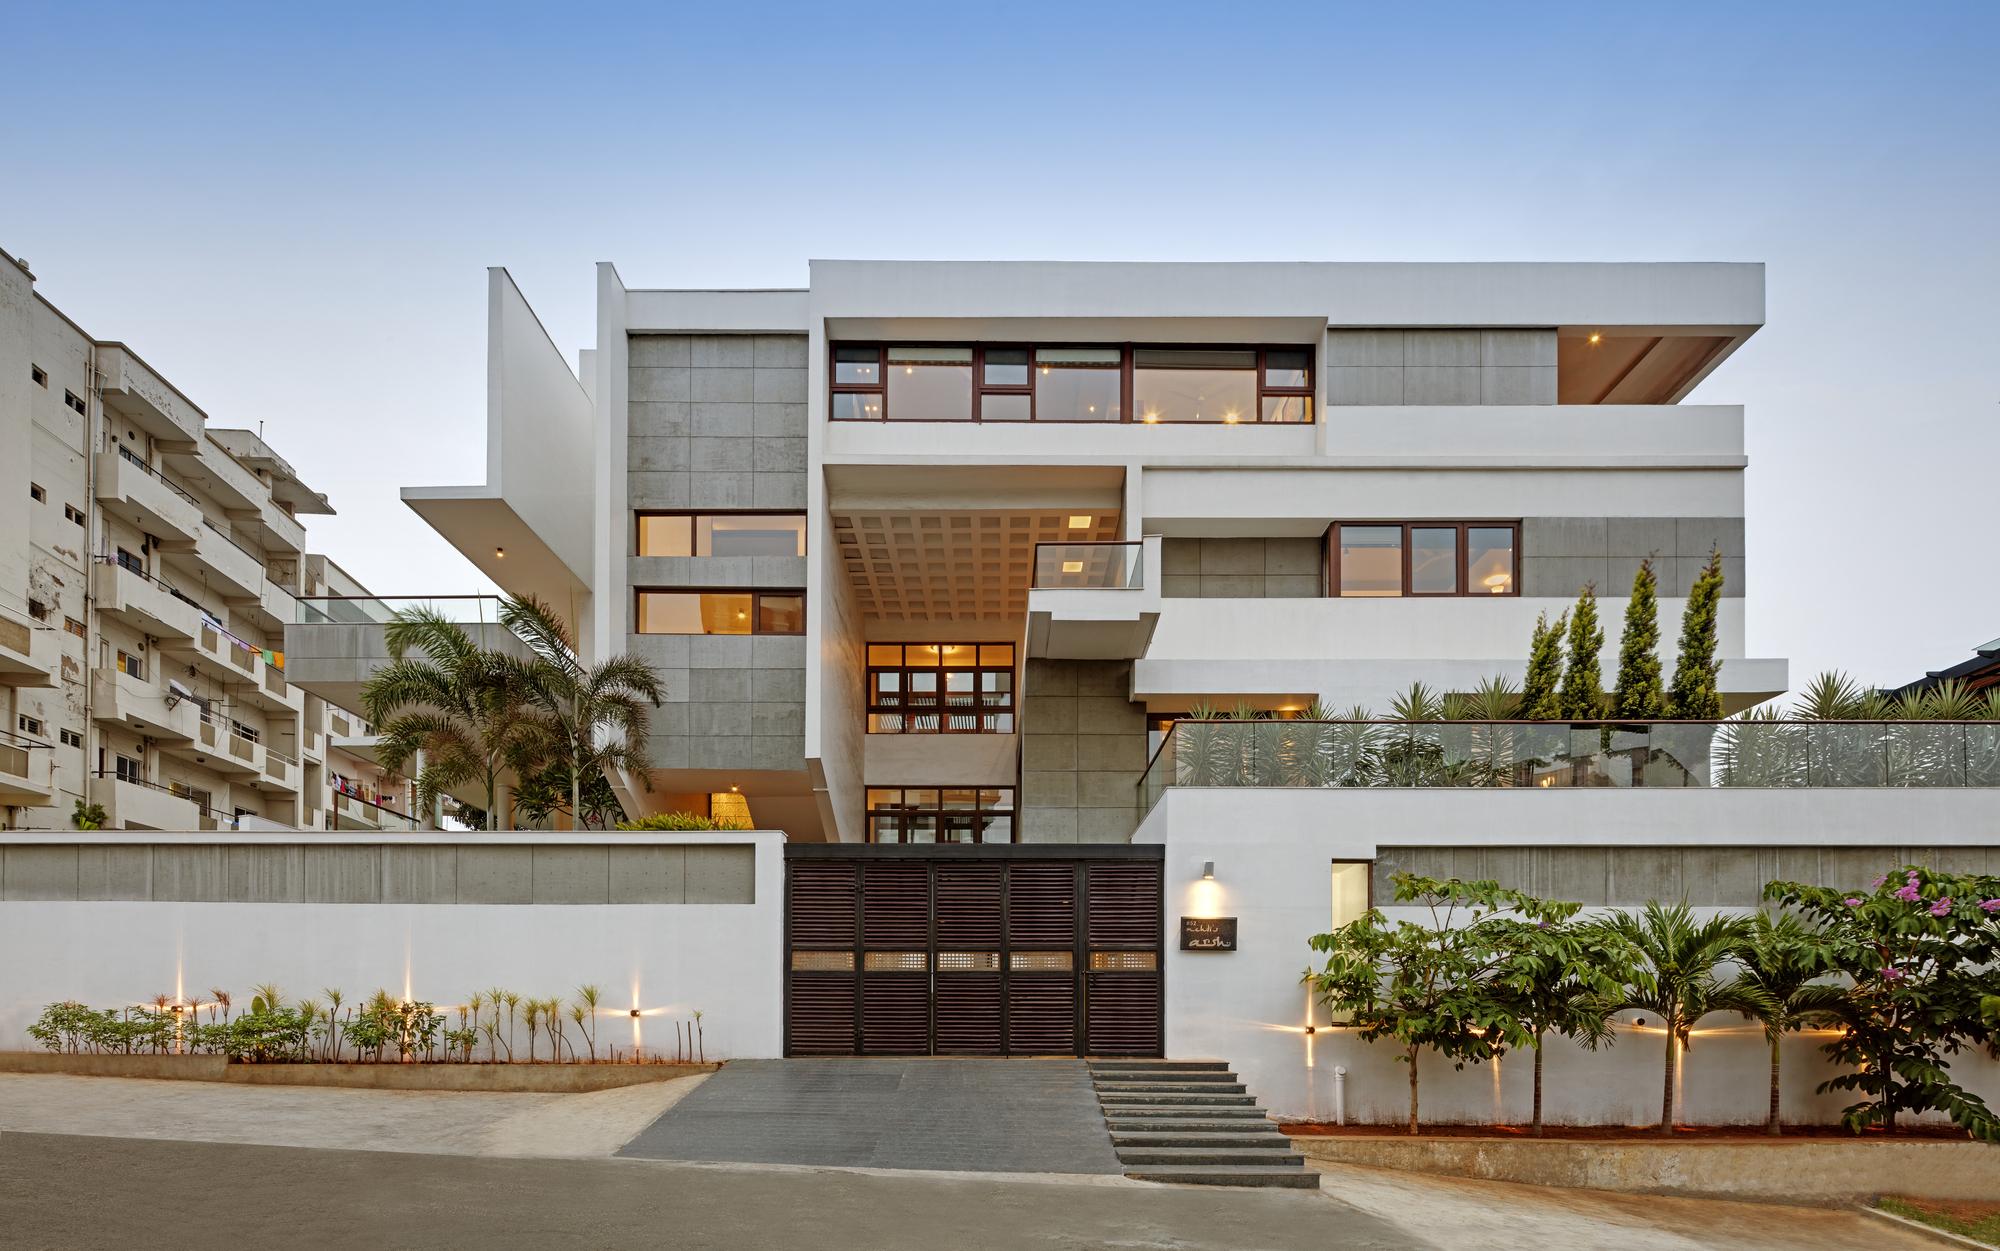 Hks House Sdeg Magnificent HKS House SDeG ArchDaily 7687 1